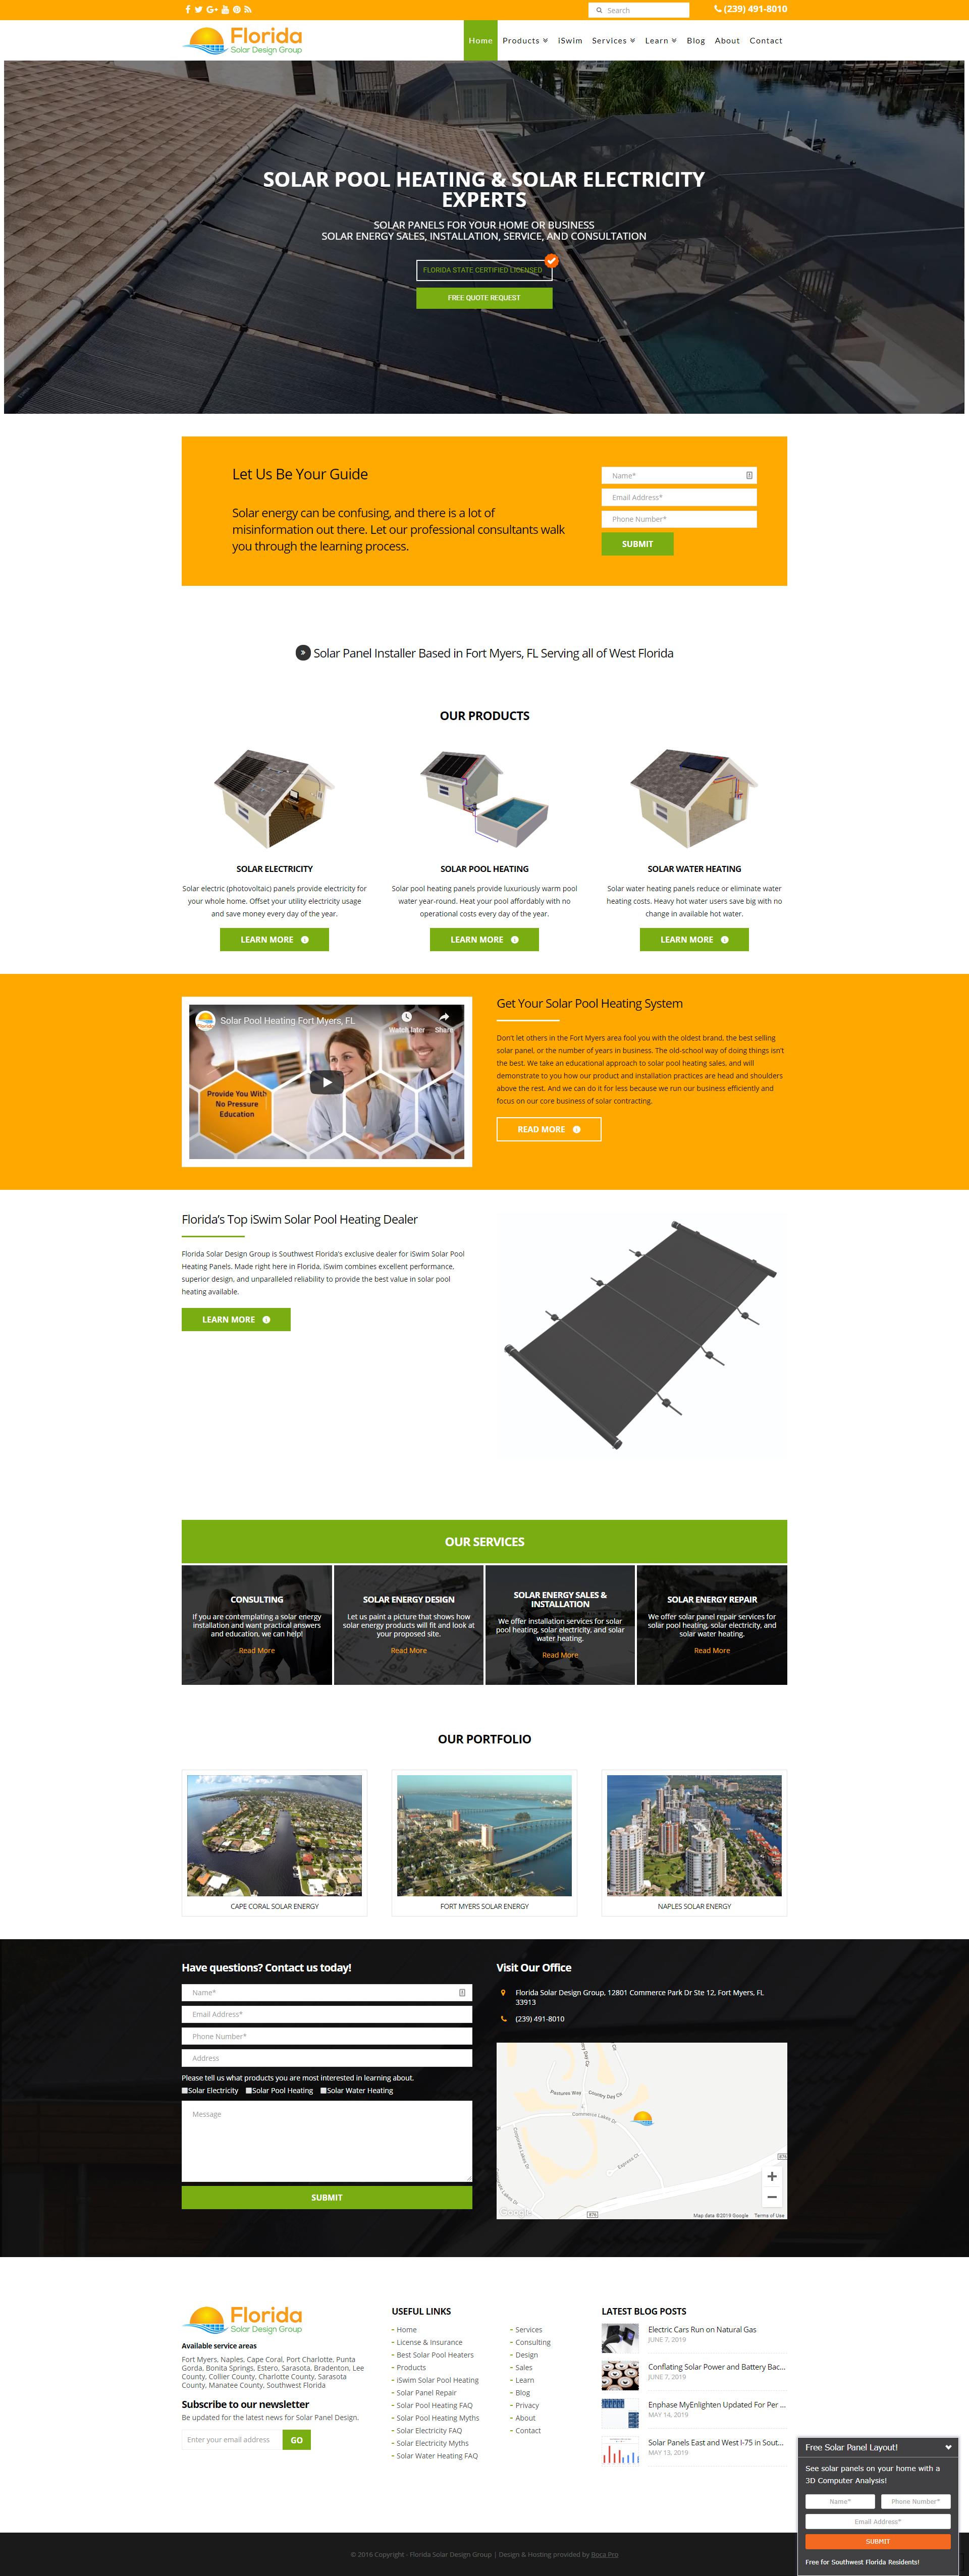 Best Solar Energy Websites 20 Inspirational Examples Dotcom Global Media Website Design Blog Solar Energy Facts What Is Solar Energy Solar Energy For Kids